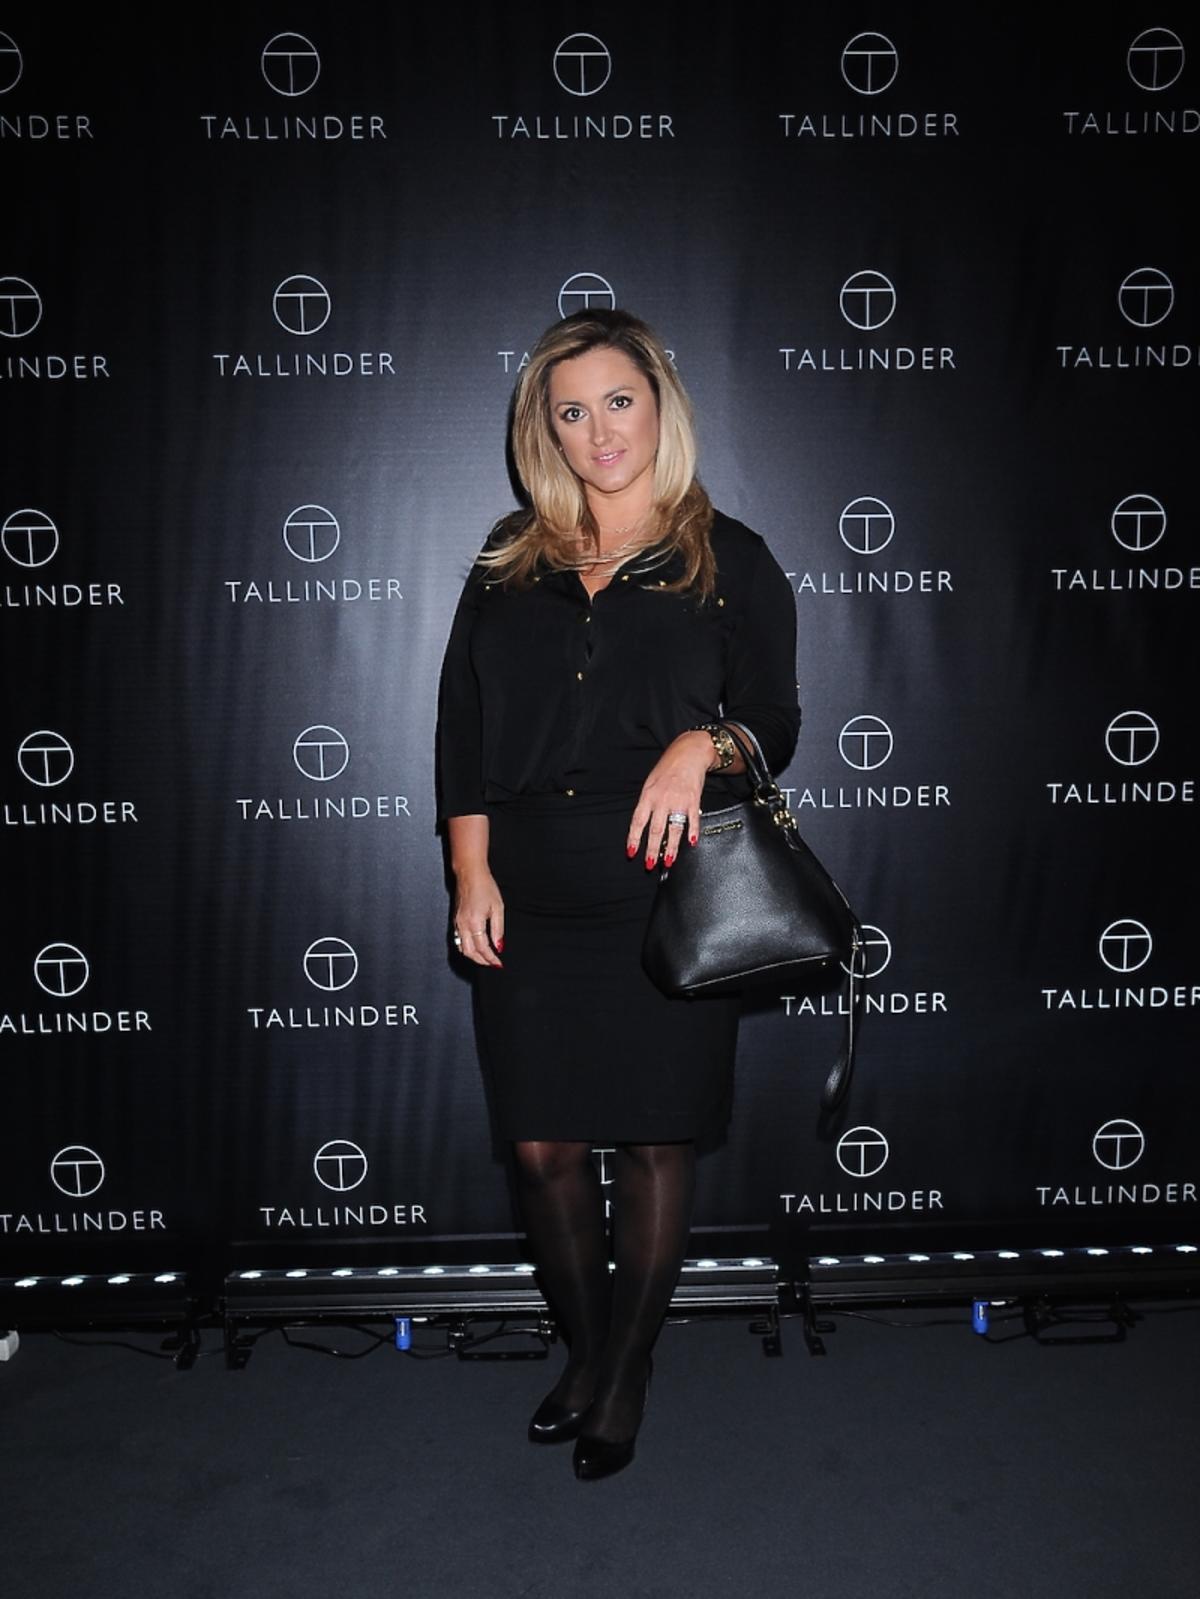 Karolina Szostak na prezentacji marki Tallinder